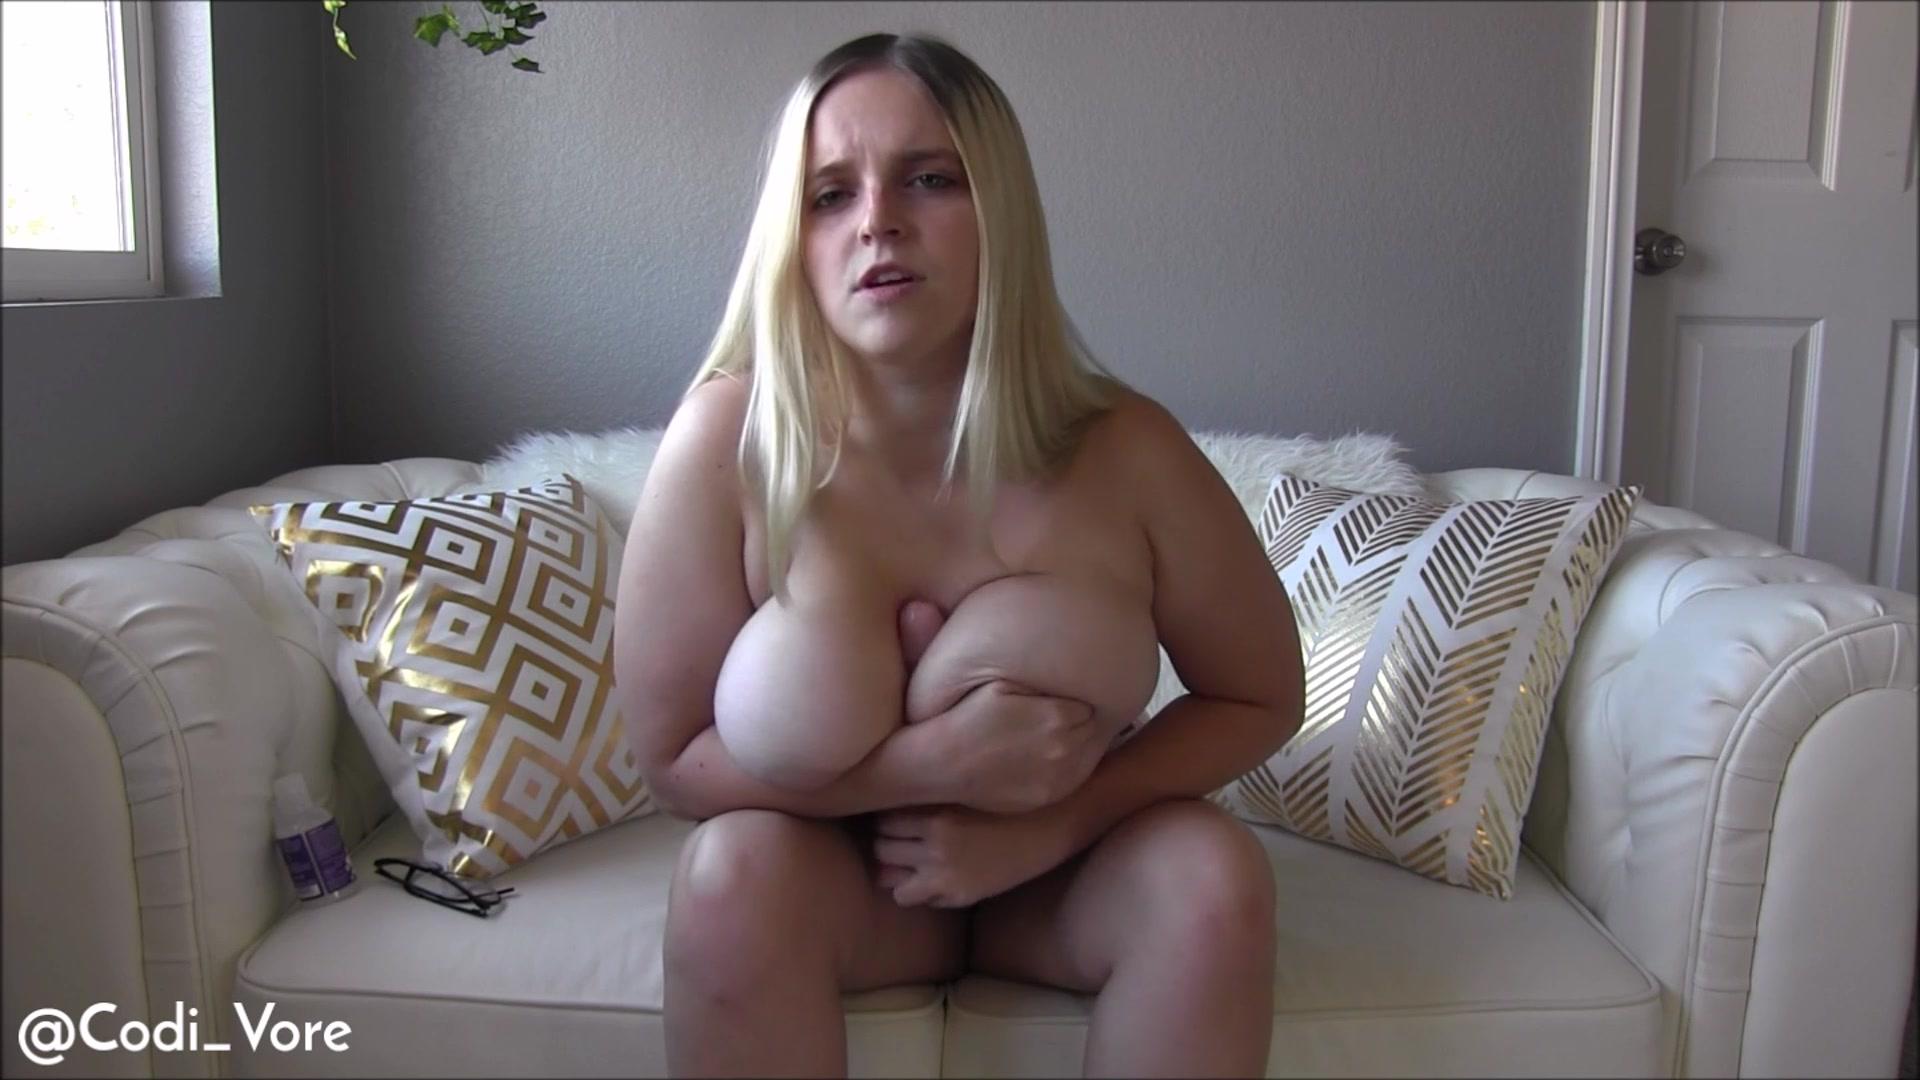 Huge tits codi joi, porn star naked boob cameltoe